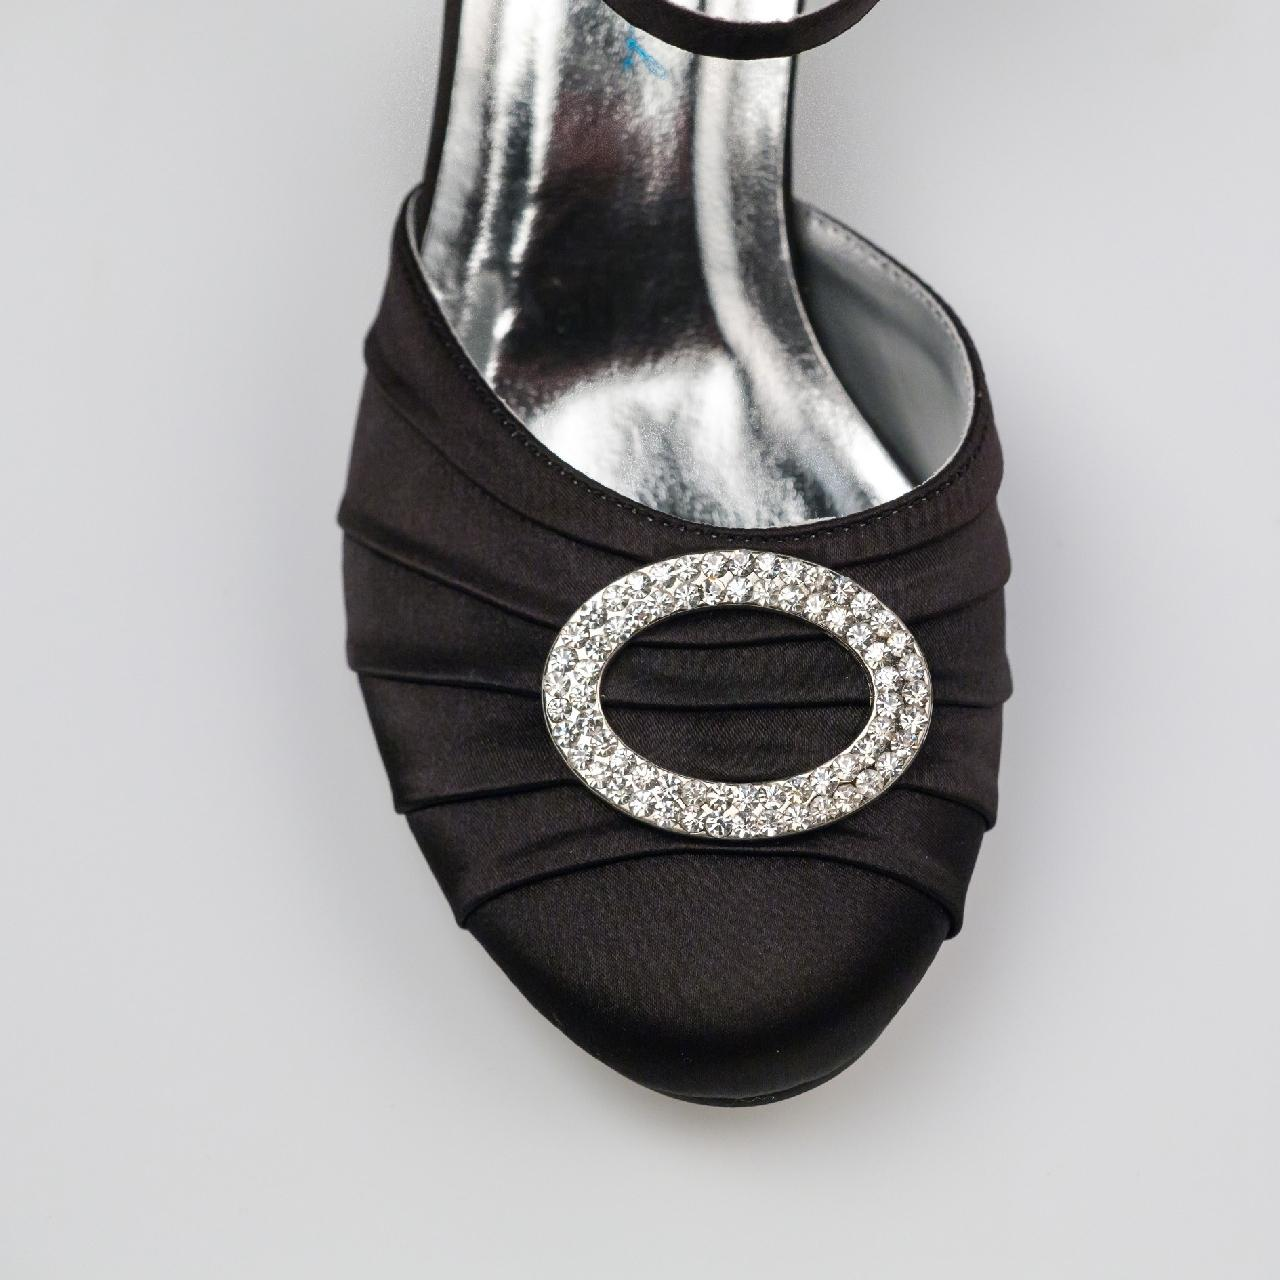 Spoločenské topánky Linda - Obrázok č. 2